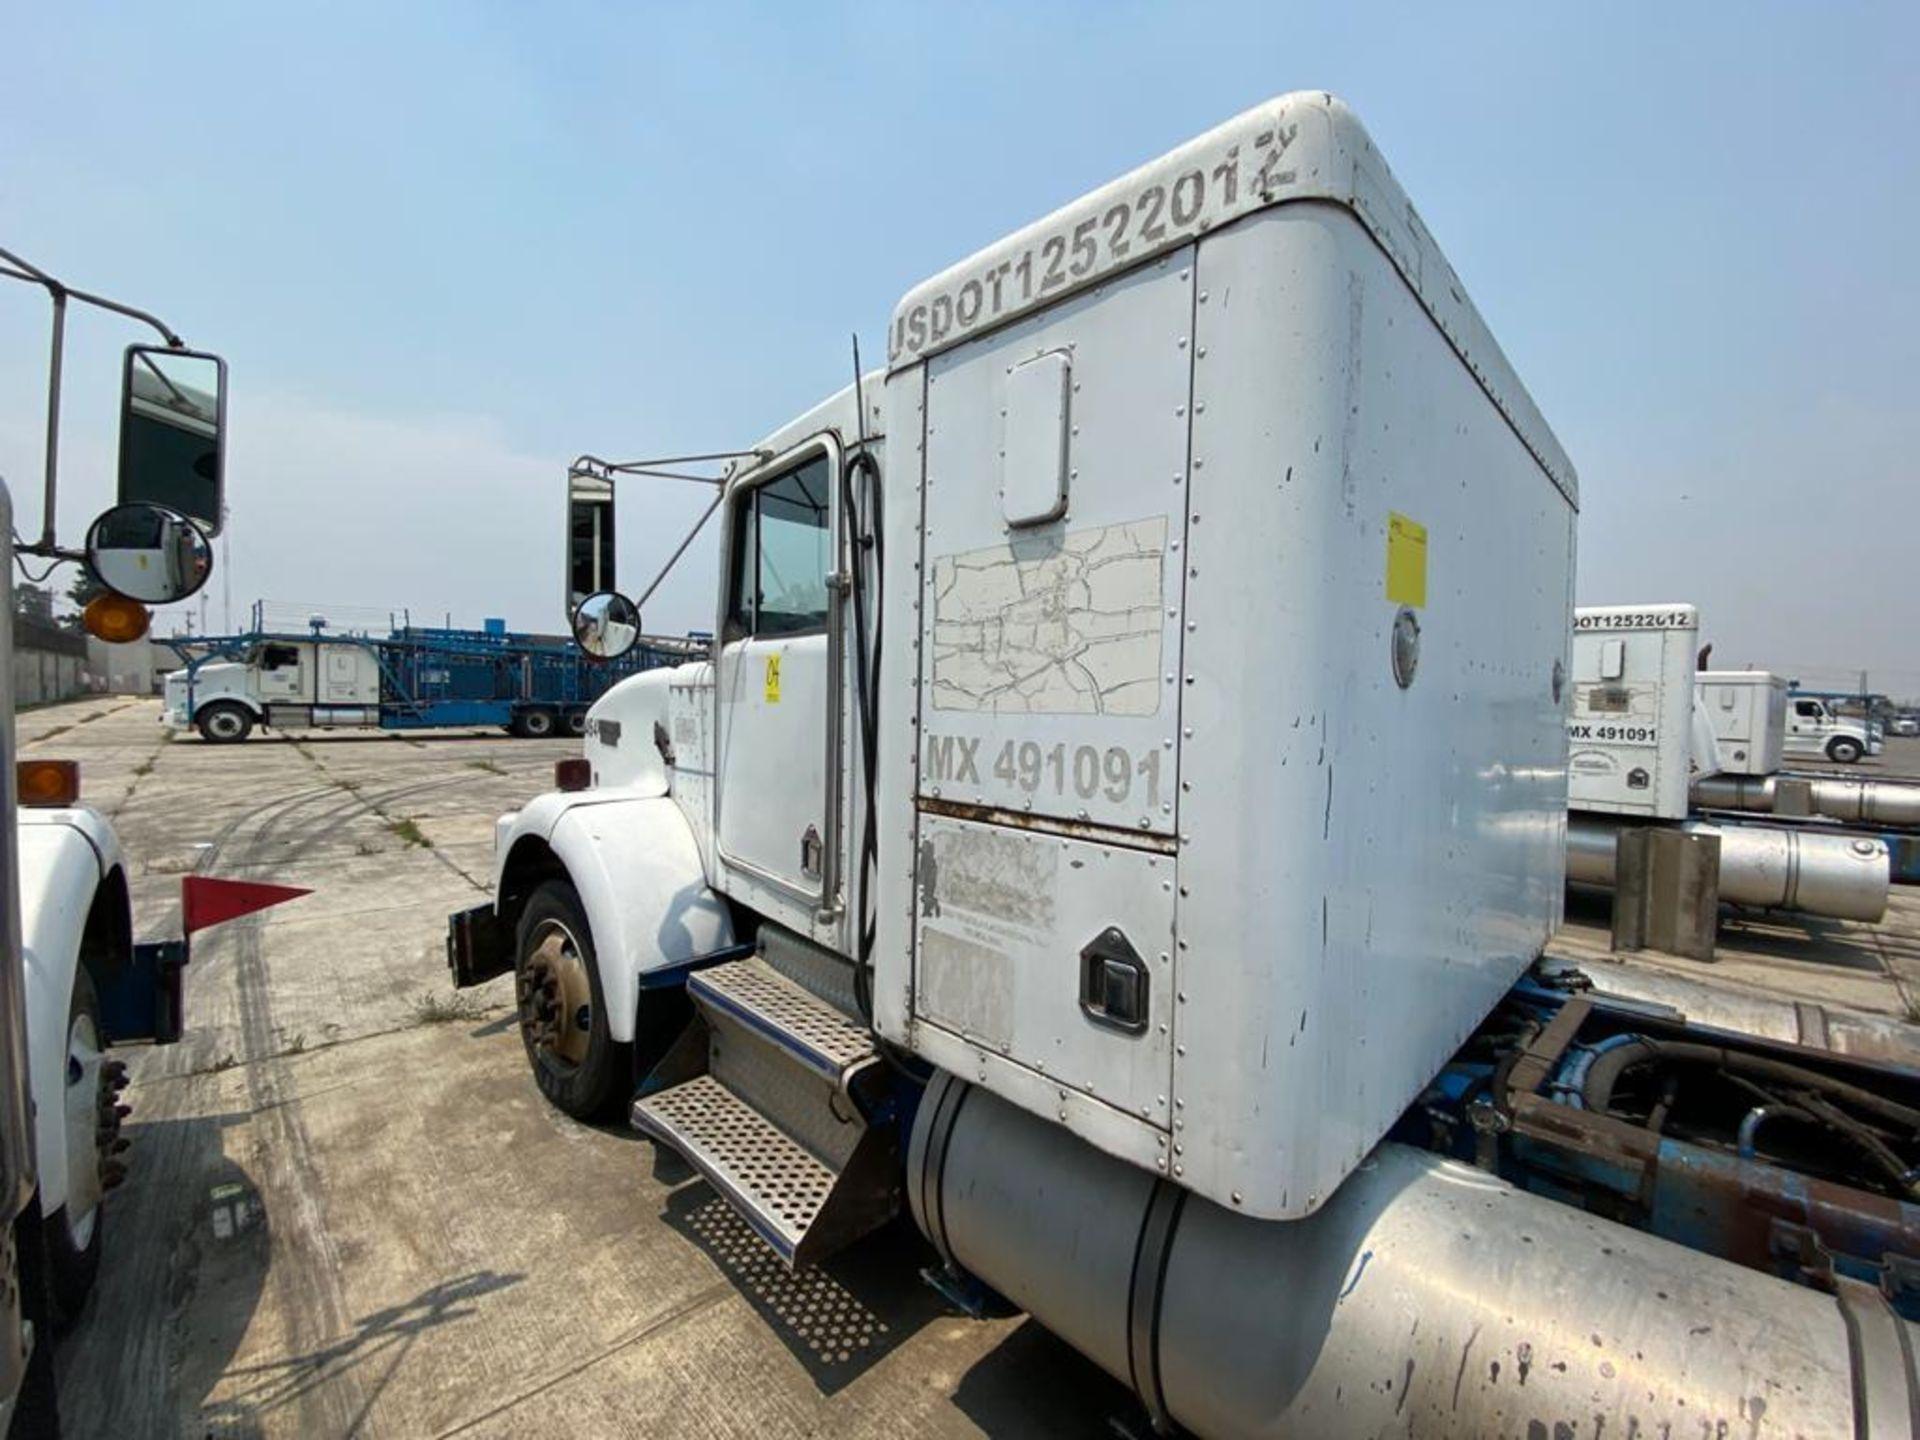 1999 Kenworth Sleeper truck tractor, standard transmission of 18 speeds - Image 12 of 70